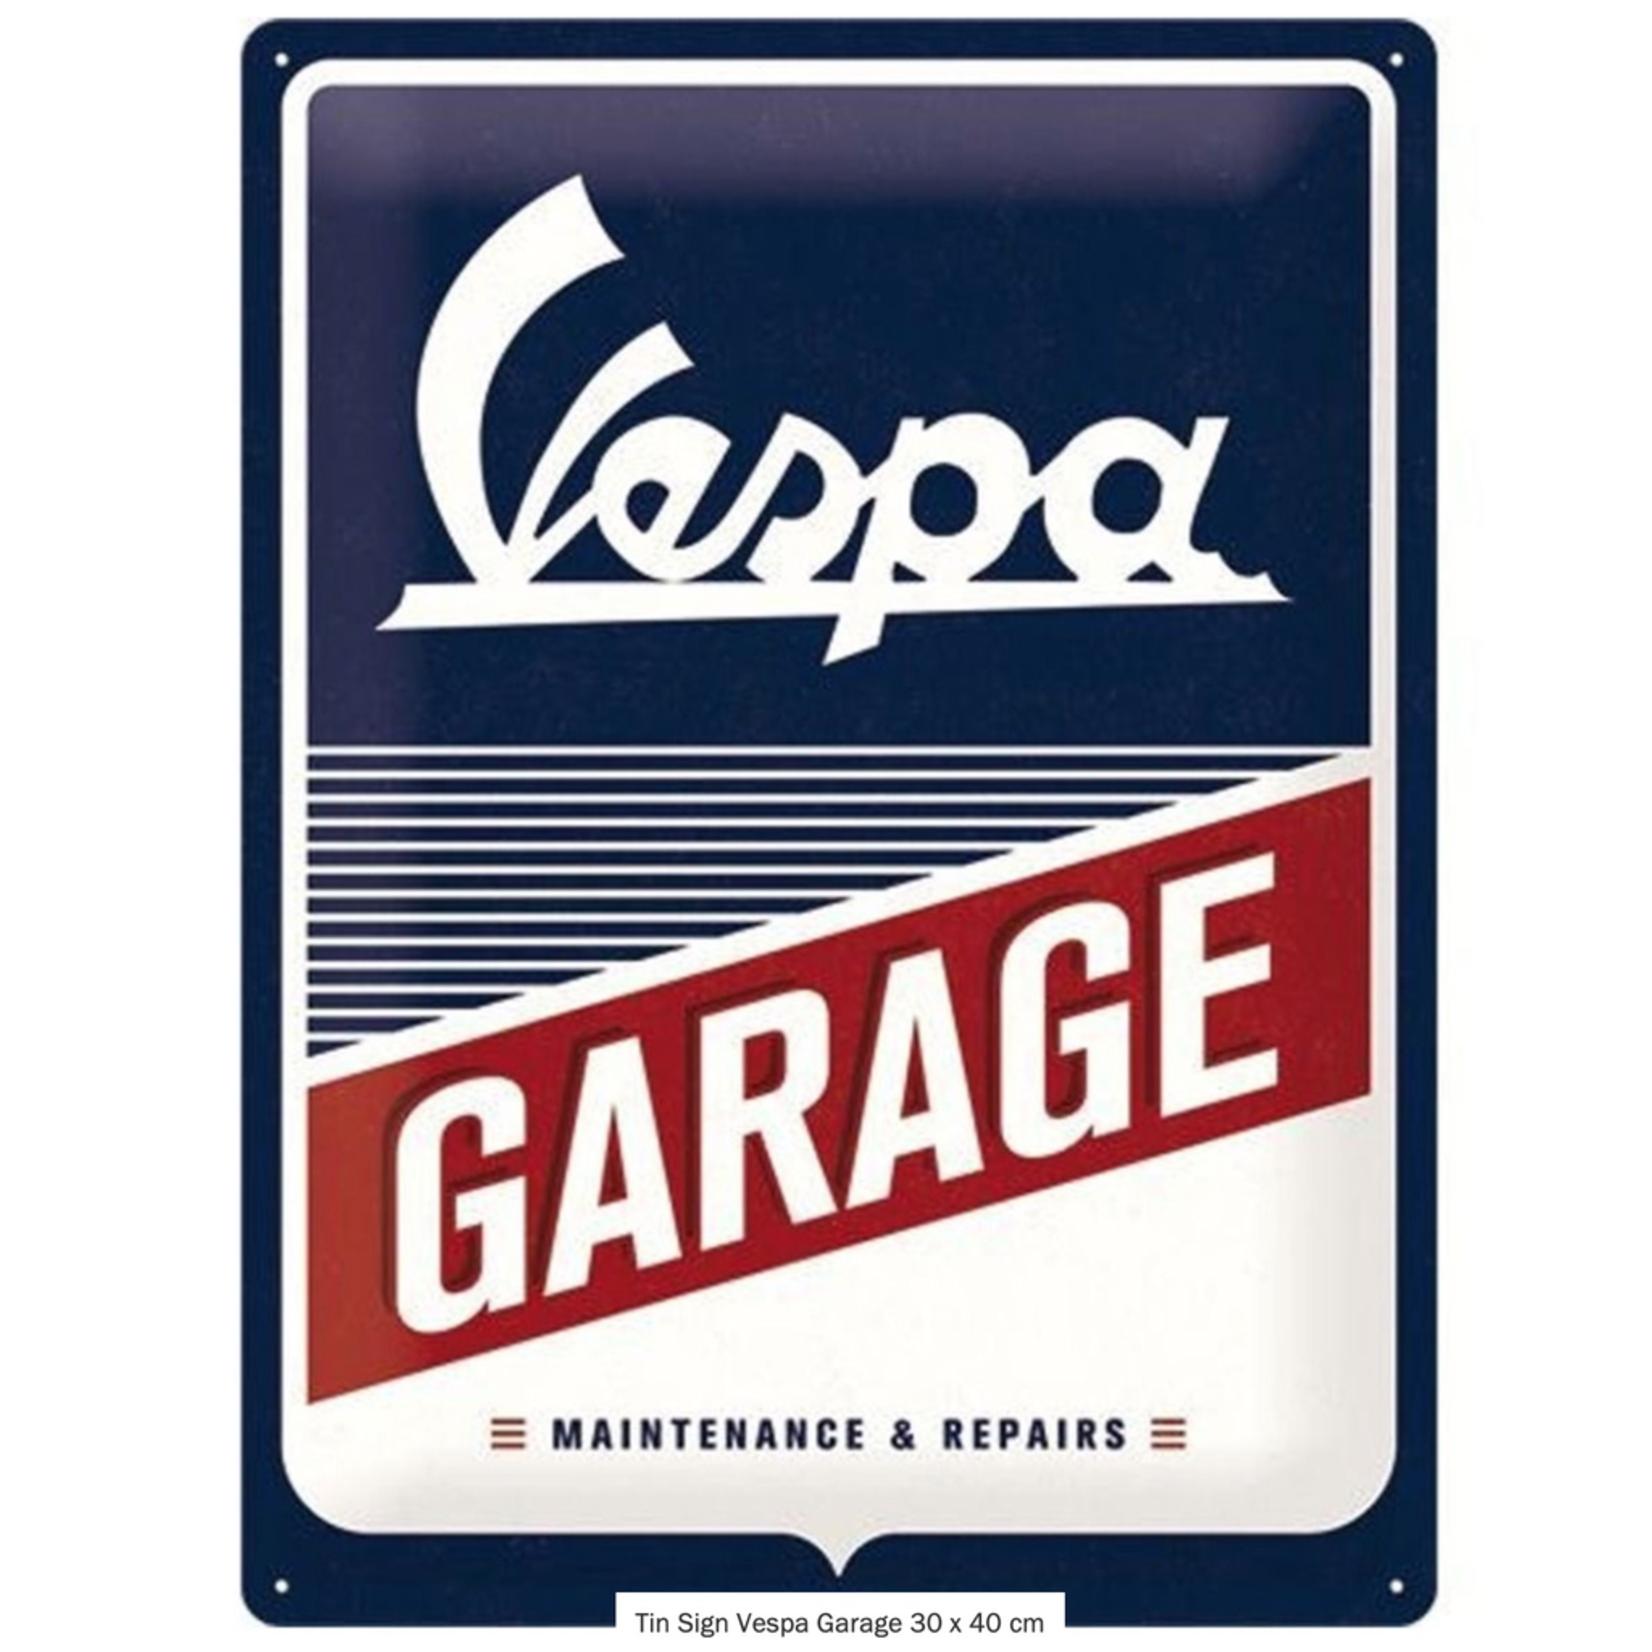 Lifestyle Sign, Vespa Garage 30 x 40 cm